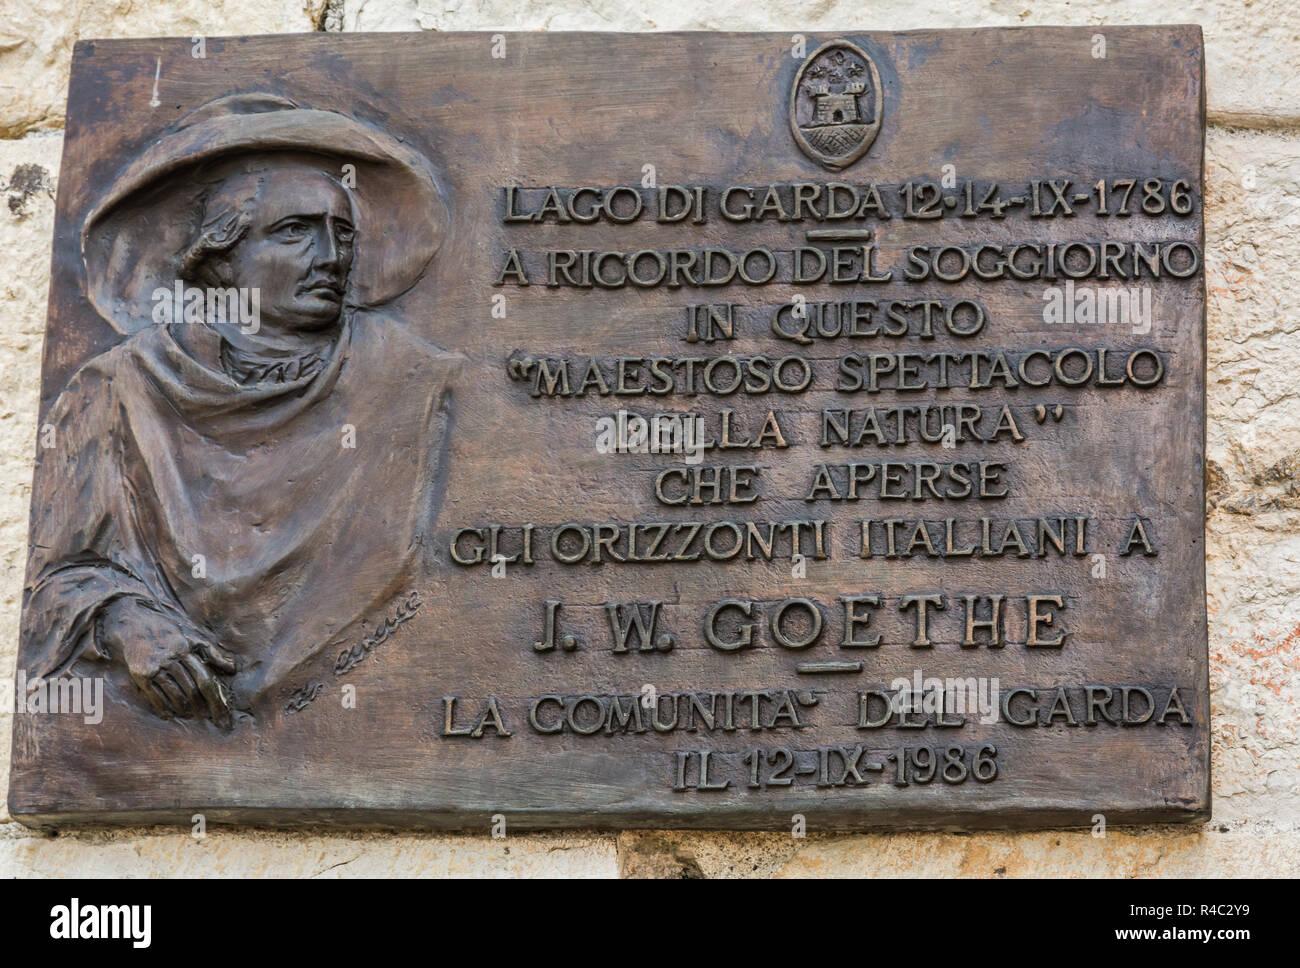 Plate dedicated to Johann Wolfgang von Goethe in Malcesine on Lake Garda in Northern Italy Stock Photo